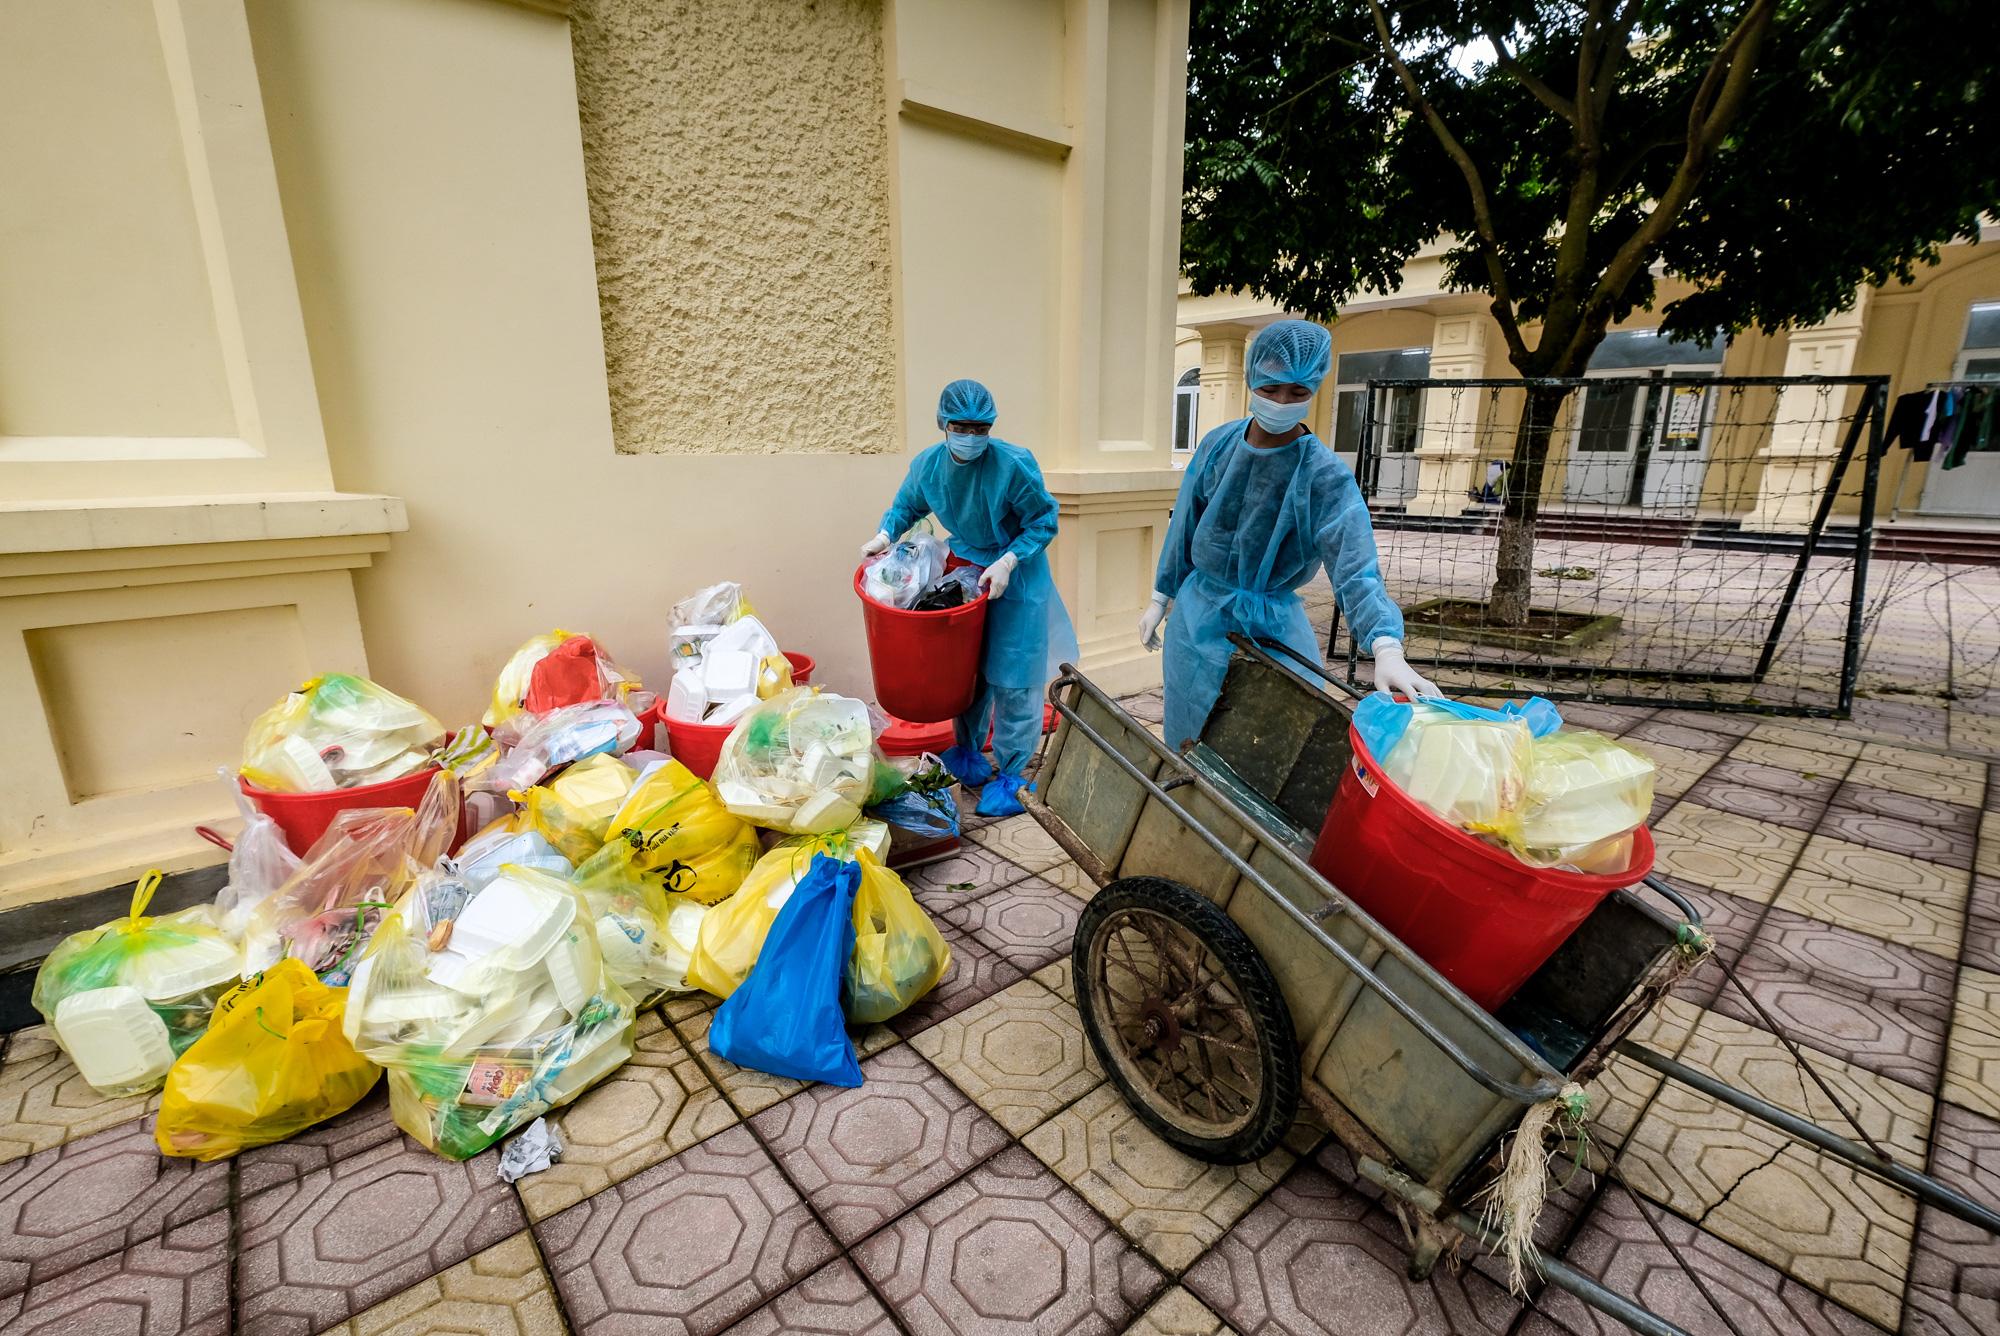 Military personnel in protective gear dispose of garbage at a COVID-19 quarantine facility in Hanoi, Vietnam. Photo: Nam Tran / Tuoi Tre